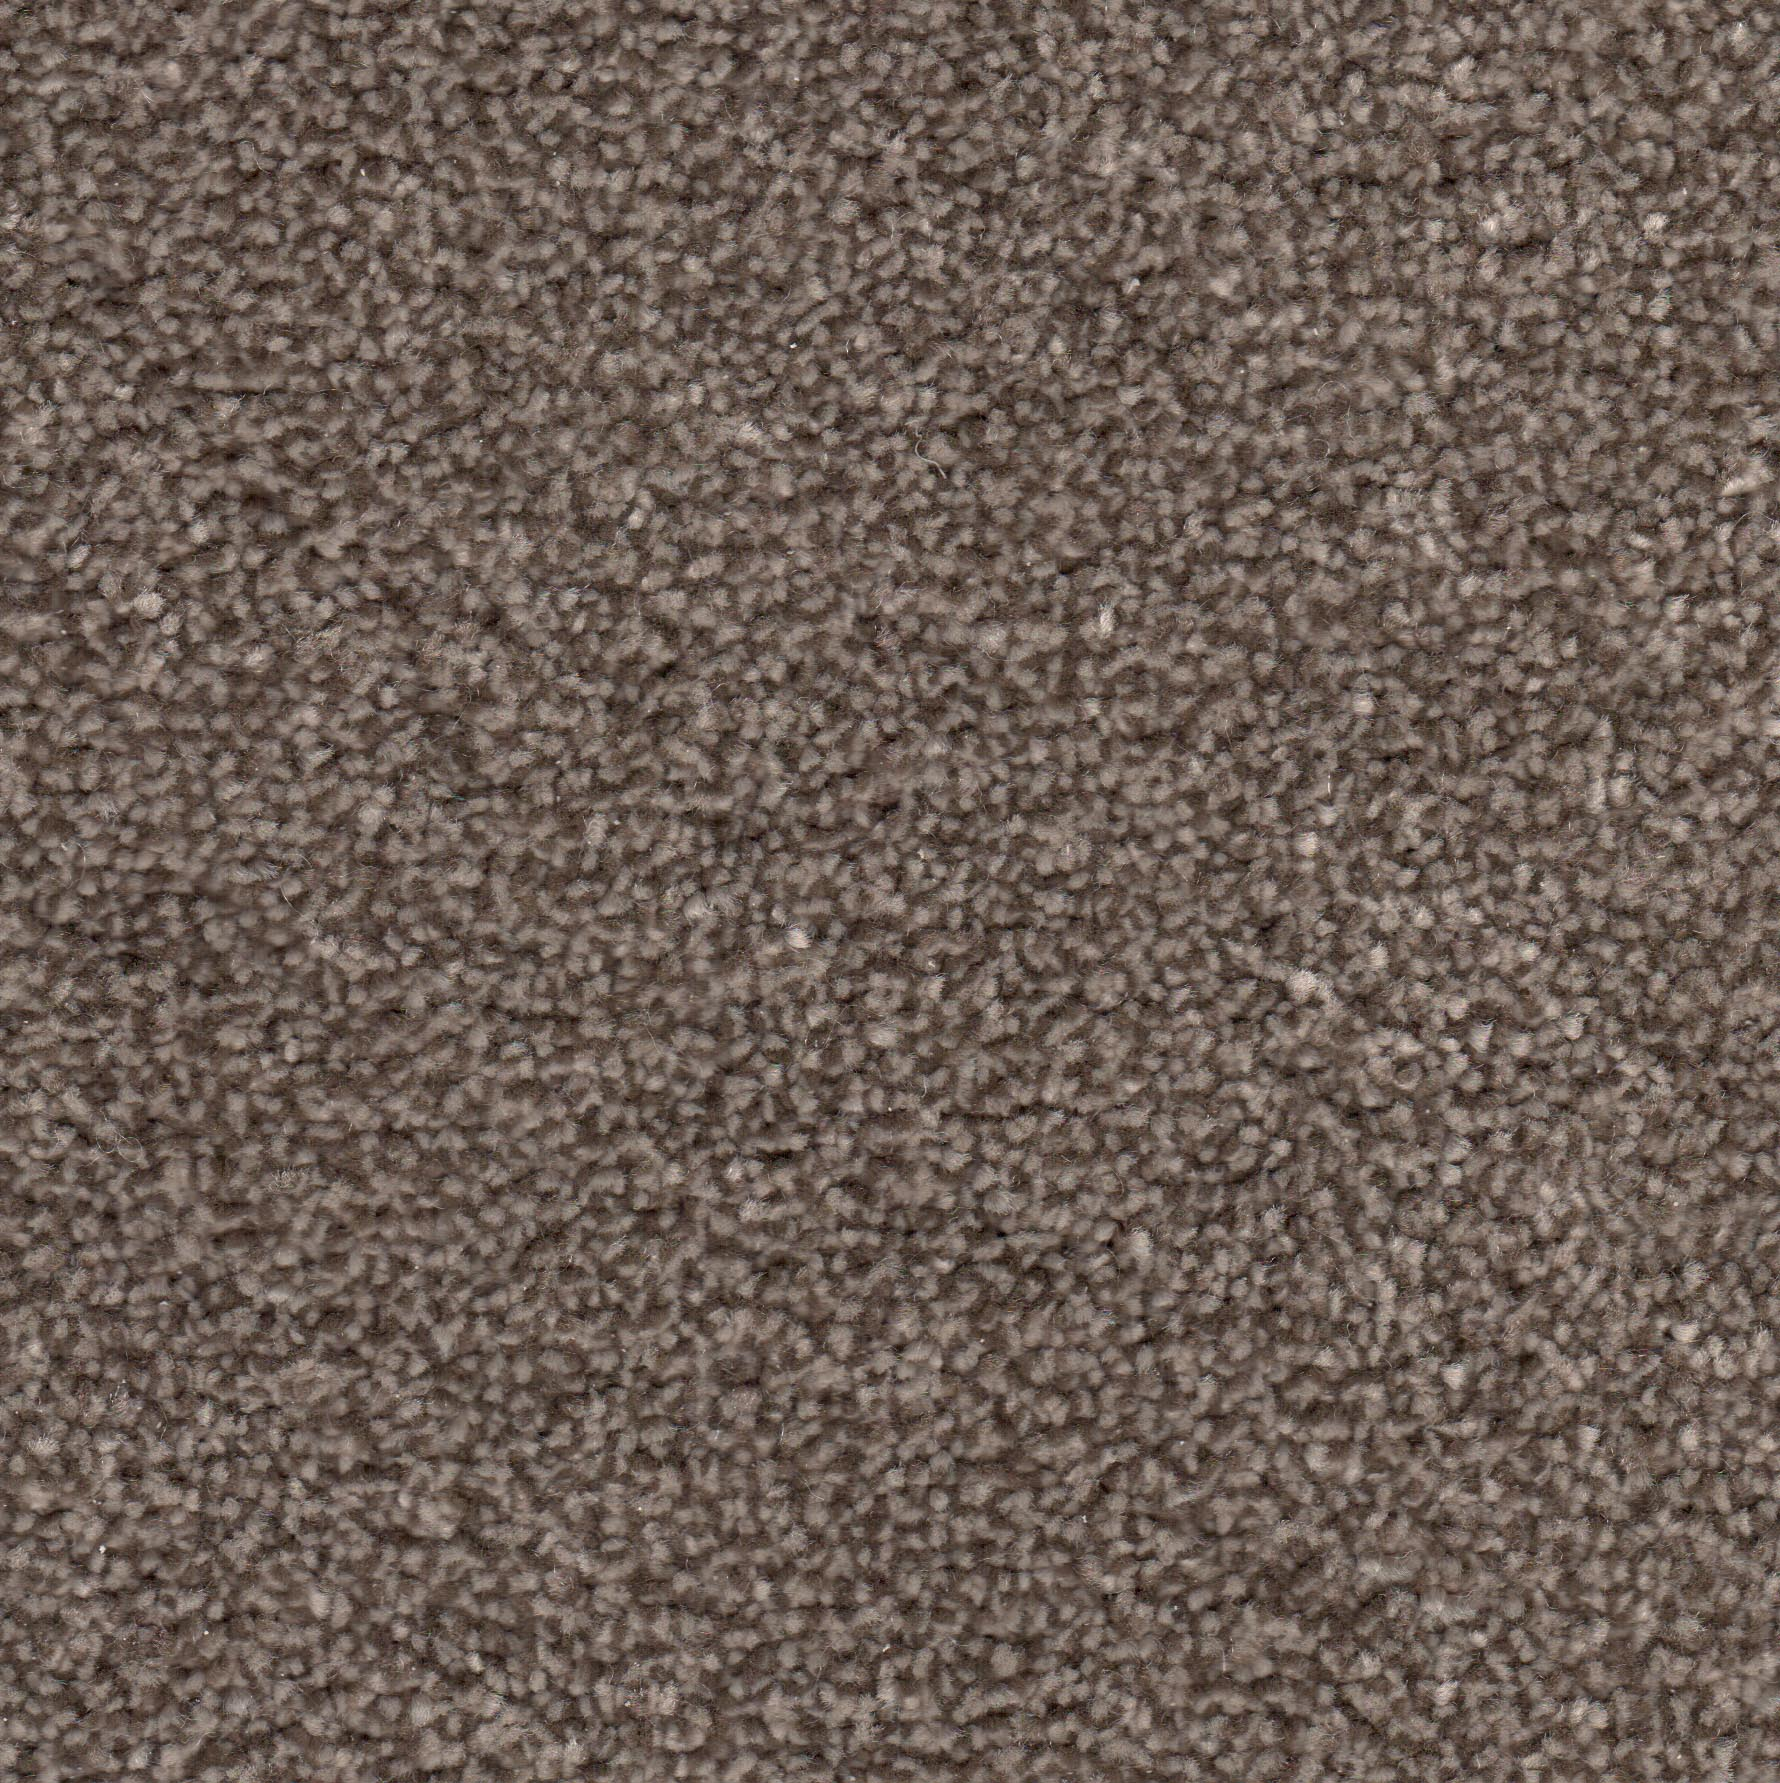 Saxony Carpets Heather Heathers Carpet Lisburn Belfast Carrickfergus Martin Phillips Carpets